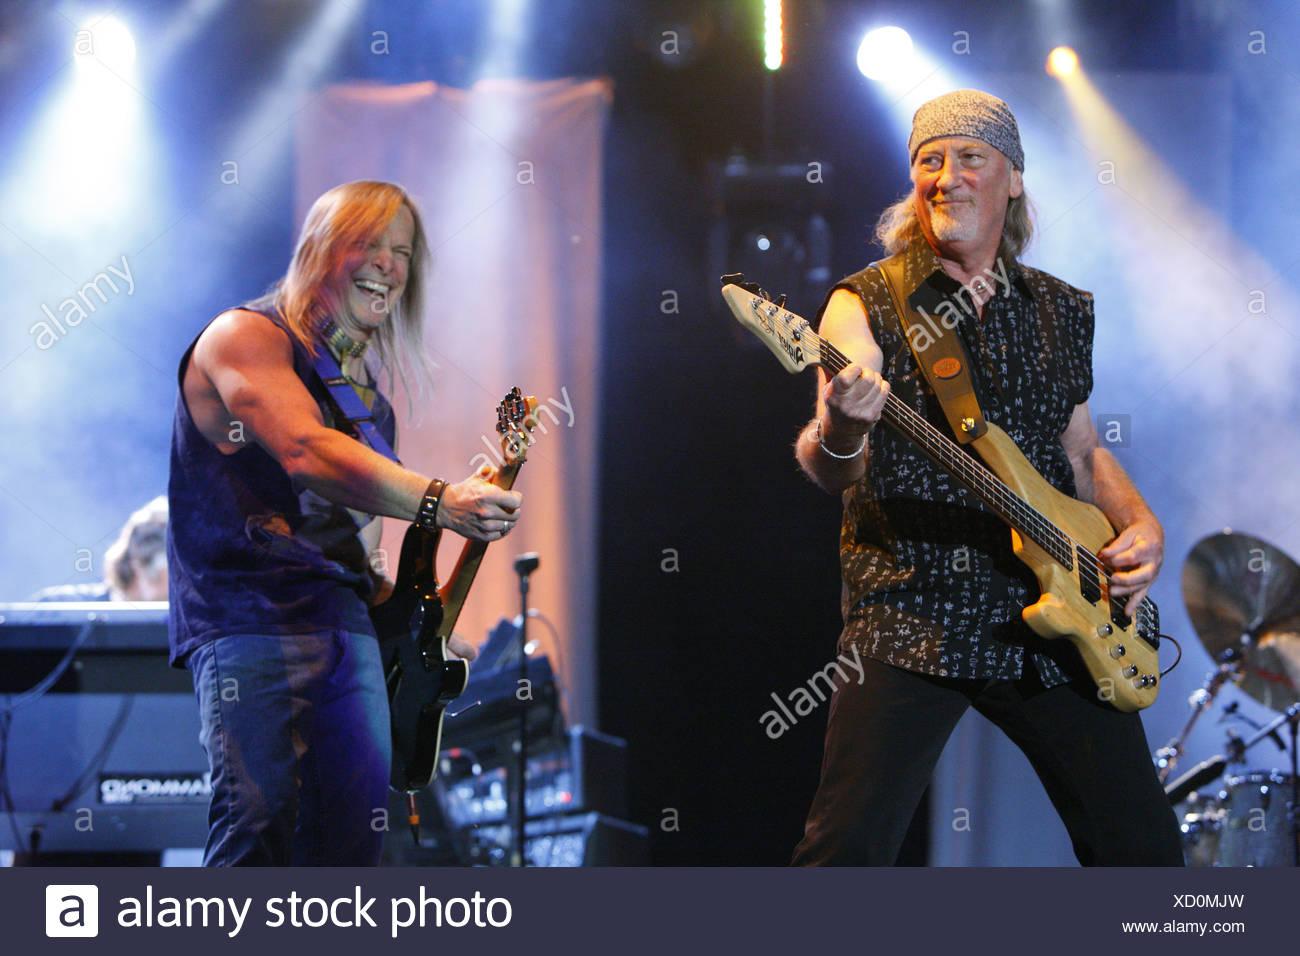 Roger Glover and Steve Morse, Deep Purple, English rock band, Open Air Festival, Muehldorf am Inn, Bavaria, Germany - Stock Image